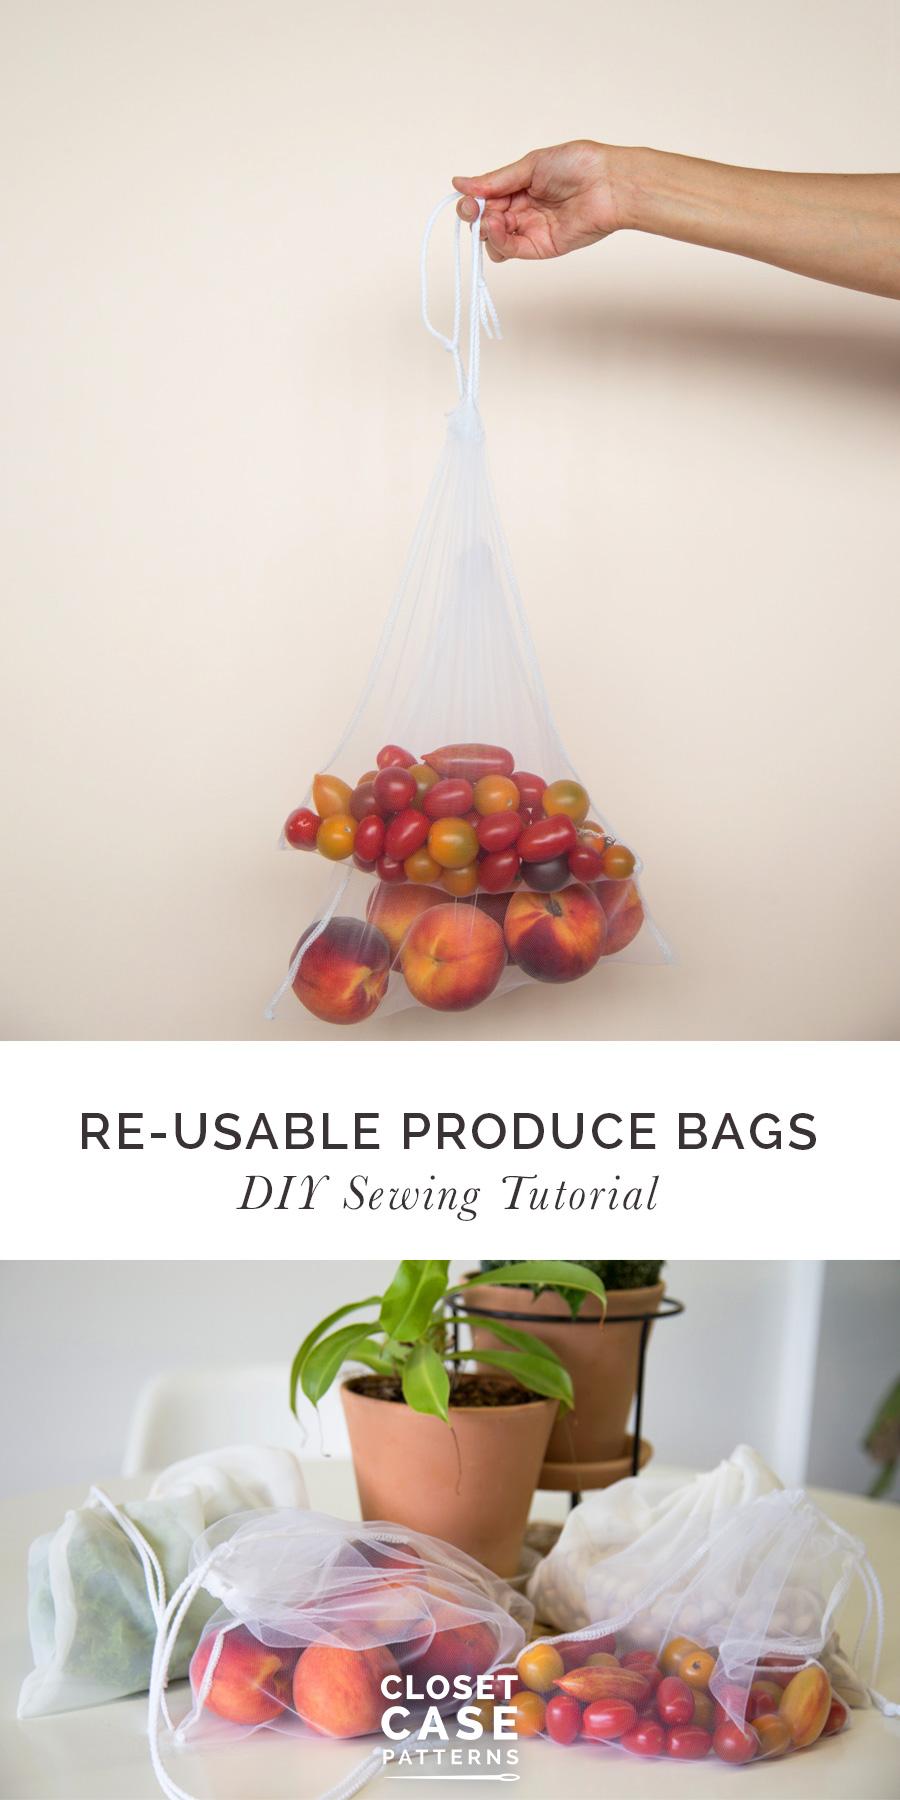 Reusable produce bags sewing tutorial DIY